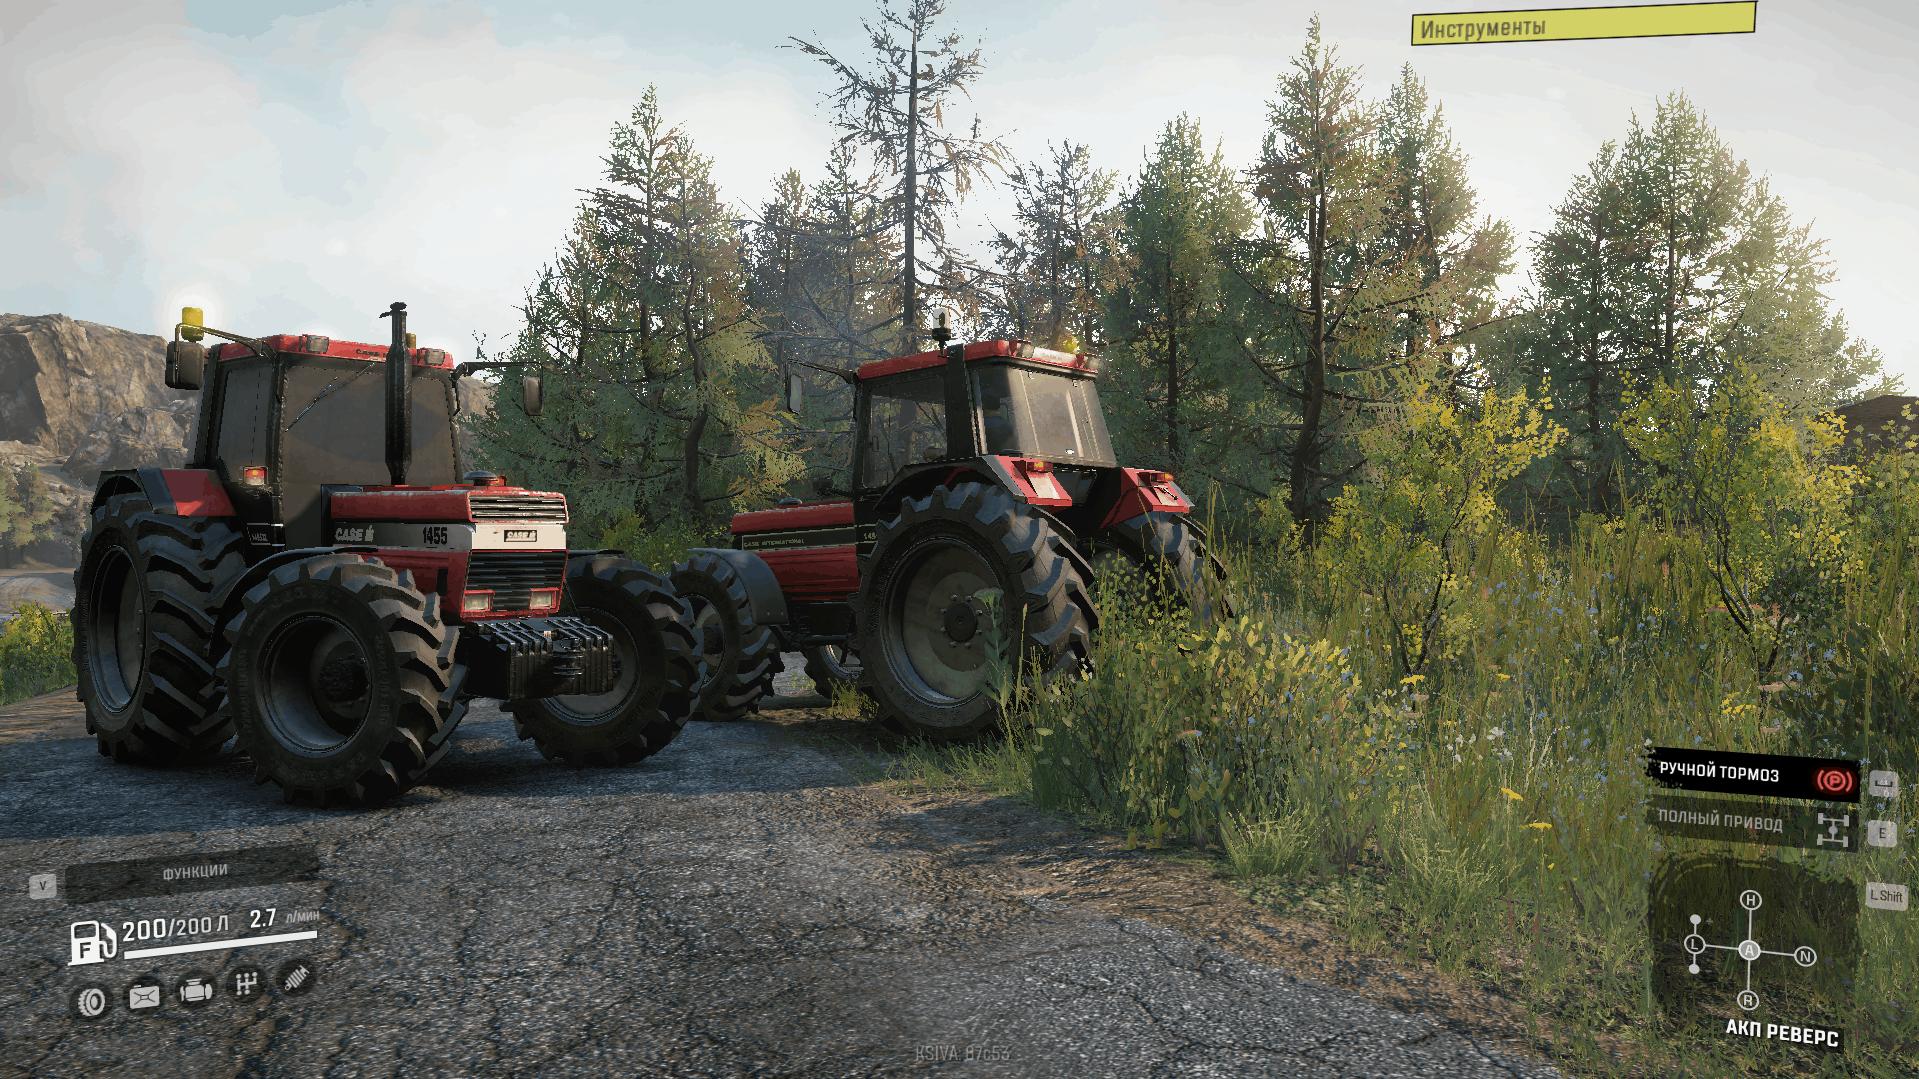 SnowRunner - Case Ih 1455 XL Tractor V3.0